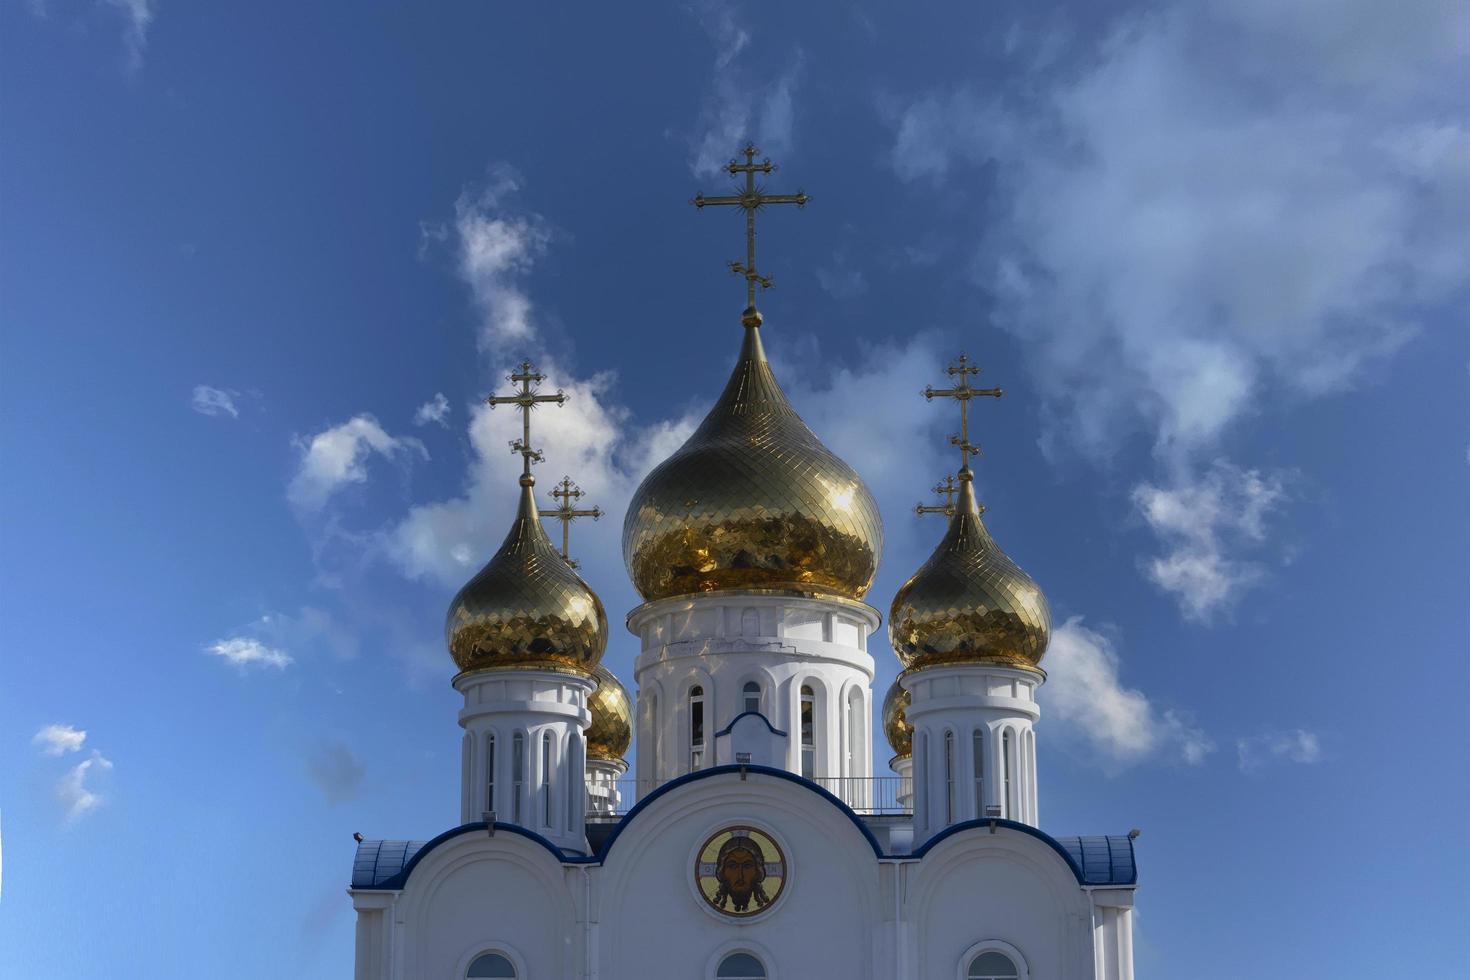 cattedrale ortodossa russa - petropavlovsk-kamchatsky foto